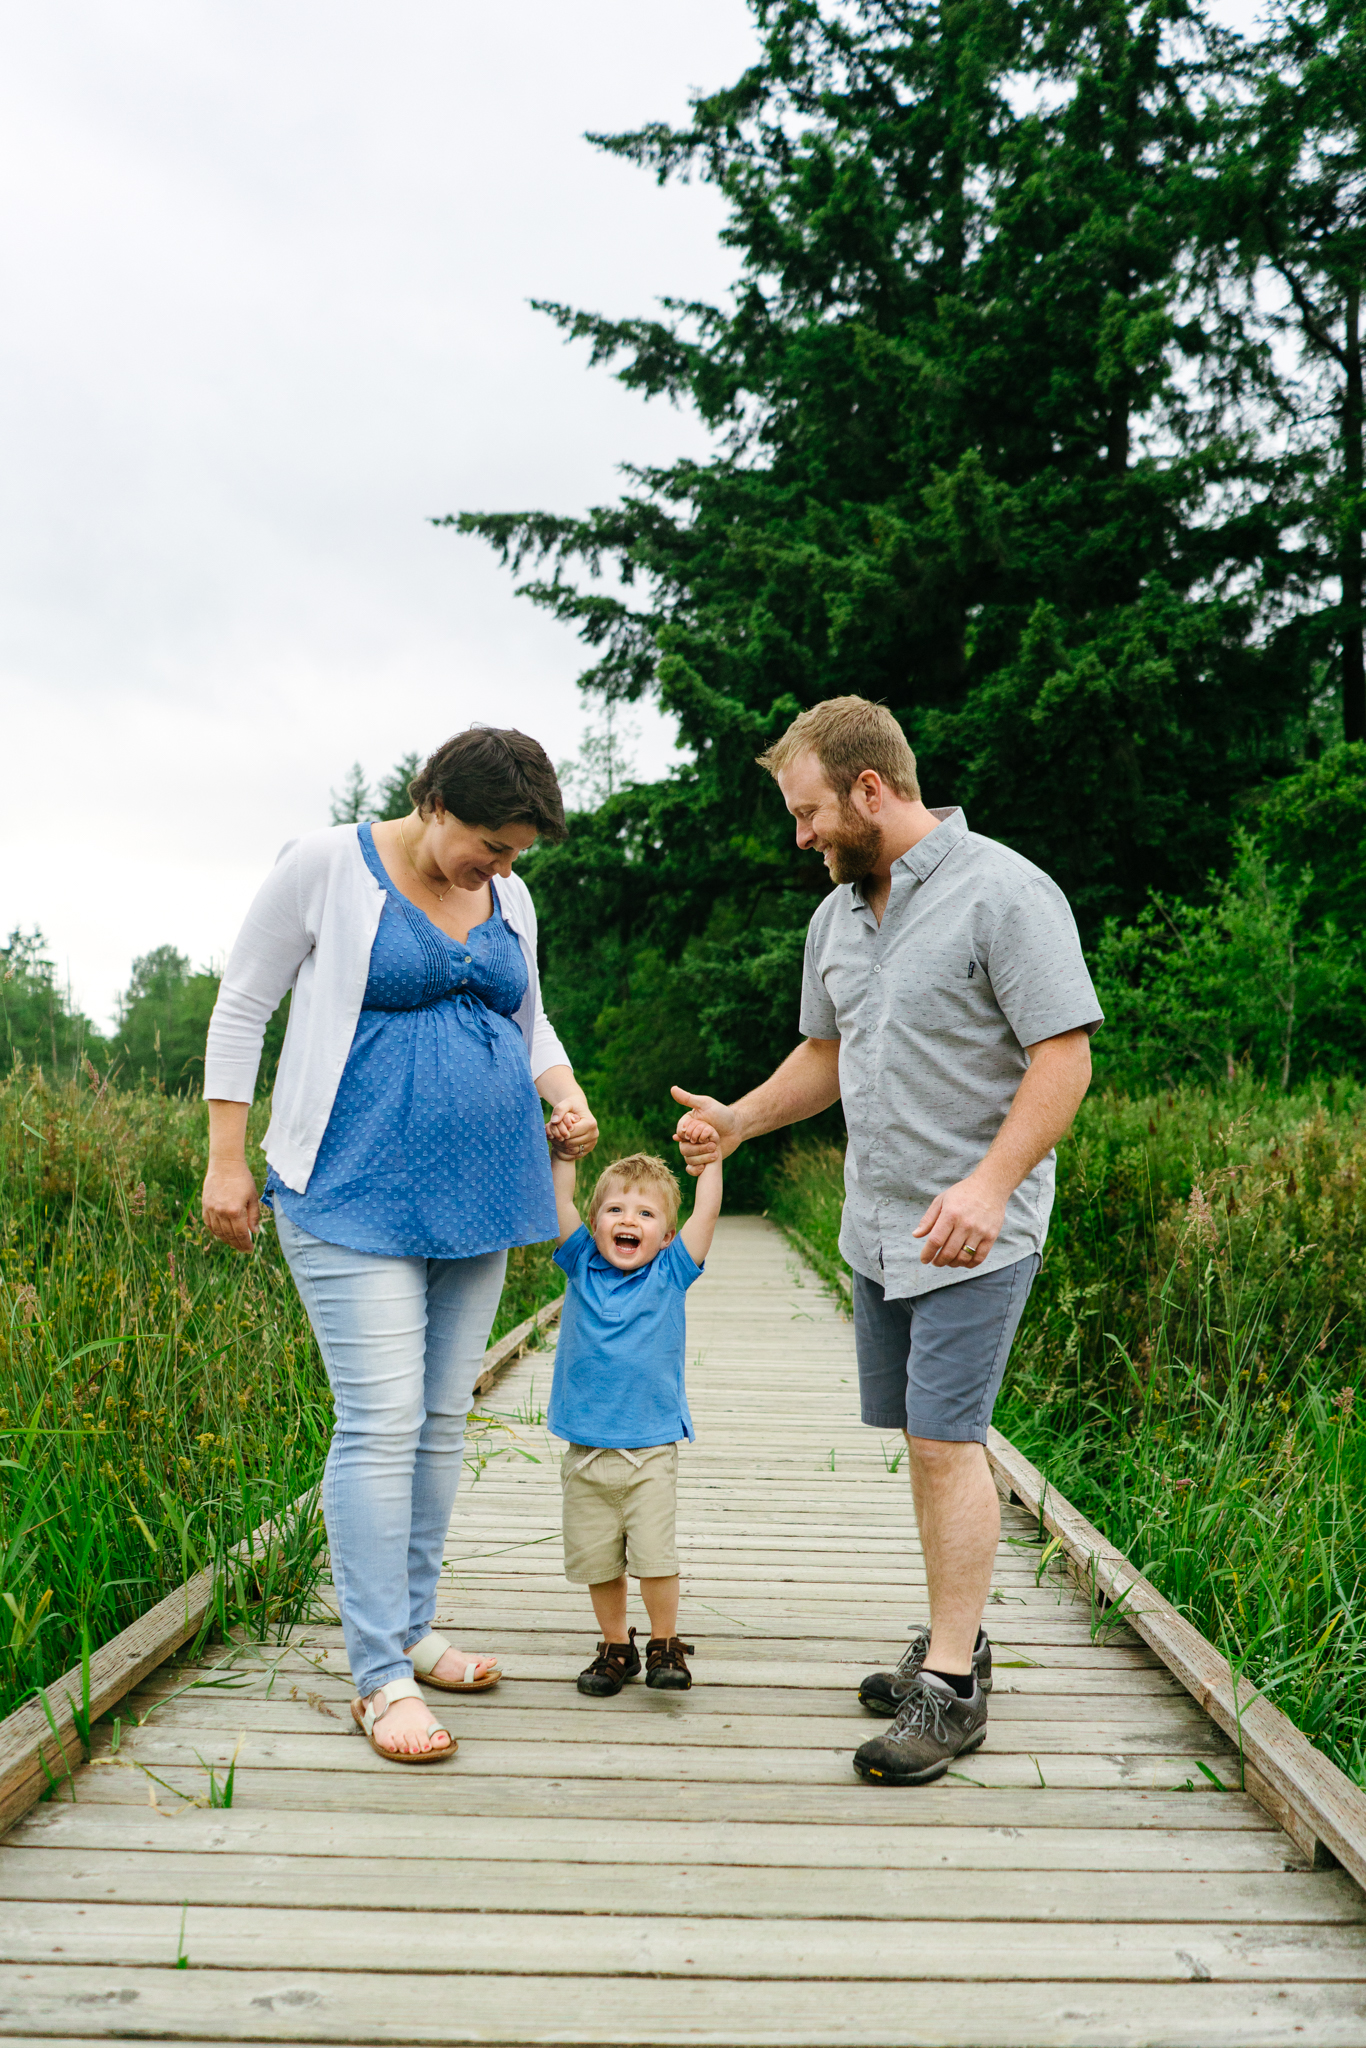 Family Portrait Photographs at Clark Lake Park in Kent, Washington